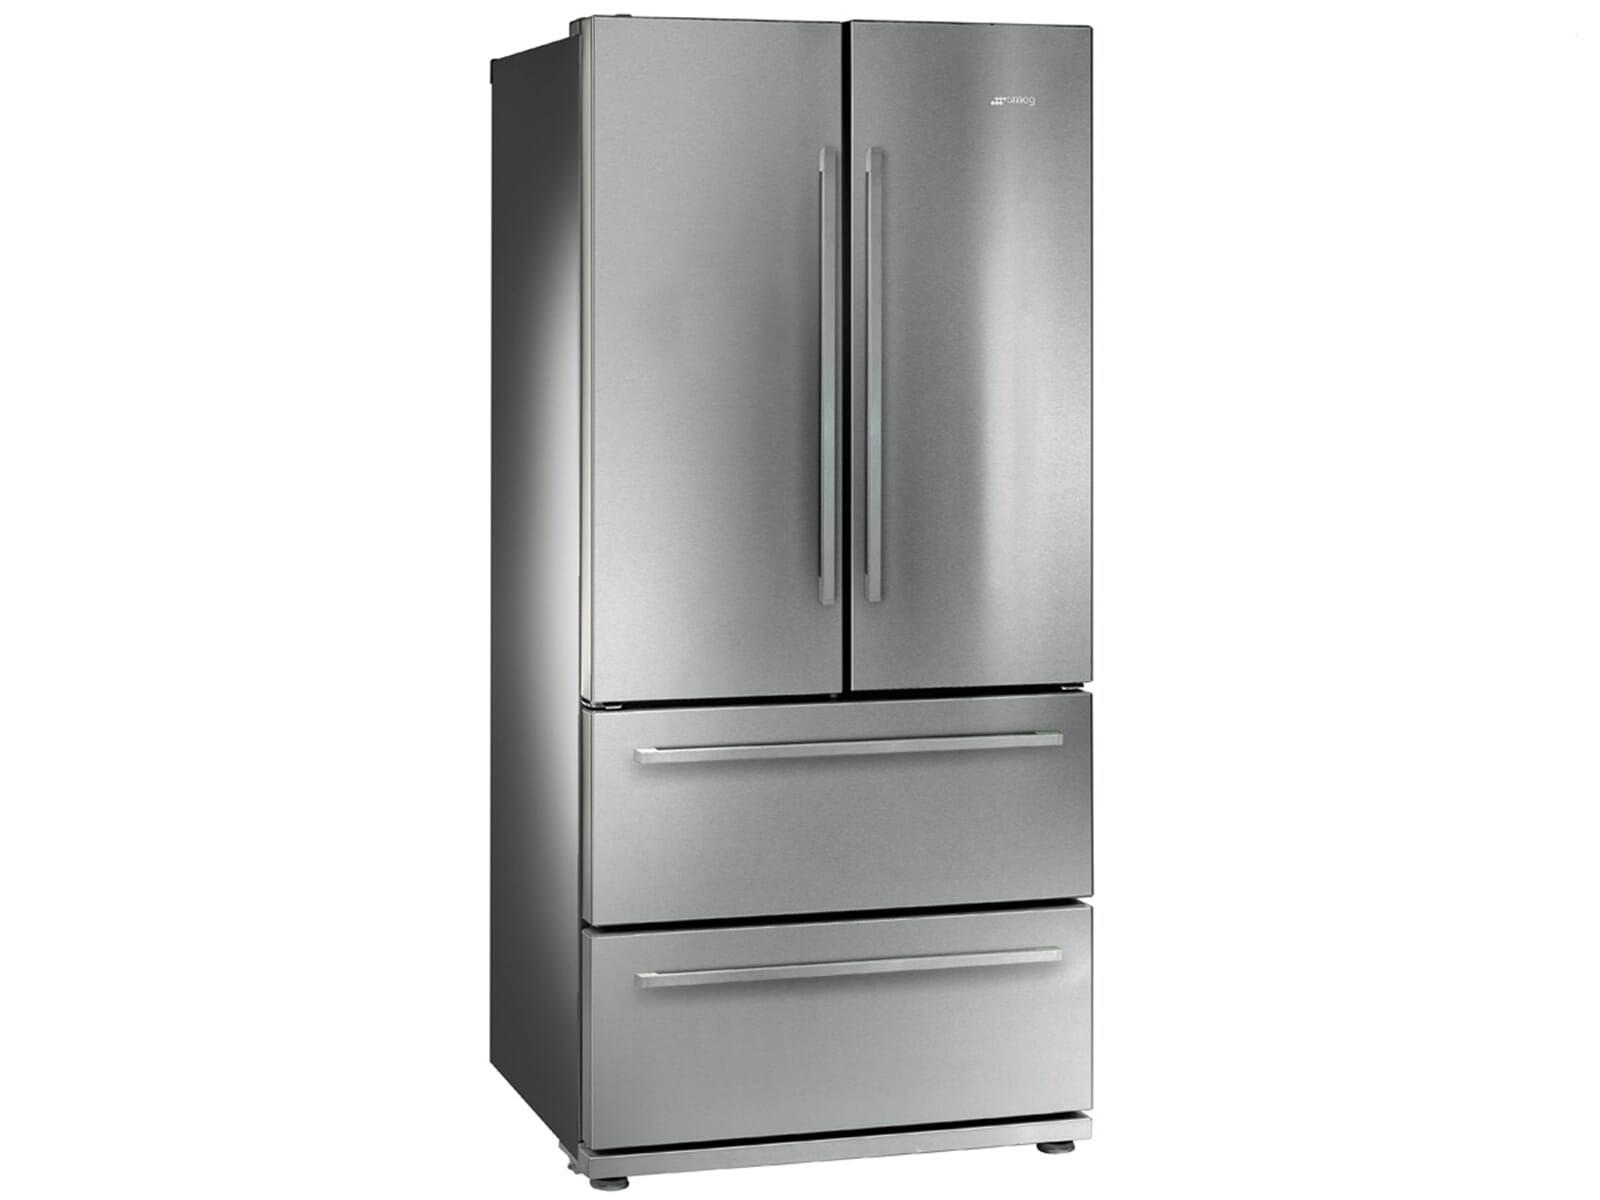 Panasonic Kühlschrank Side By Side : Daewoo kühlschrank ohne festwasseranschluss hickman beverly blog